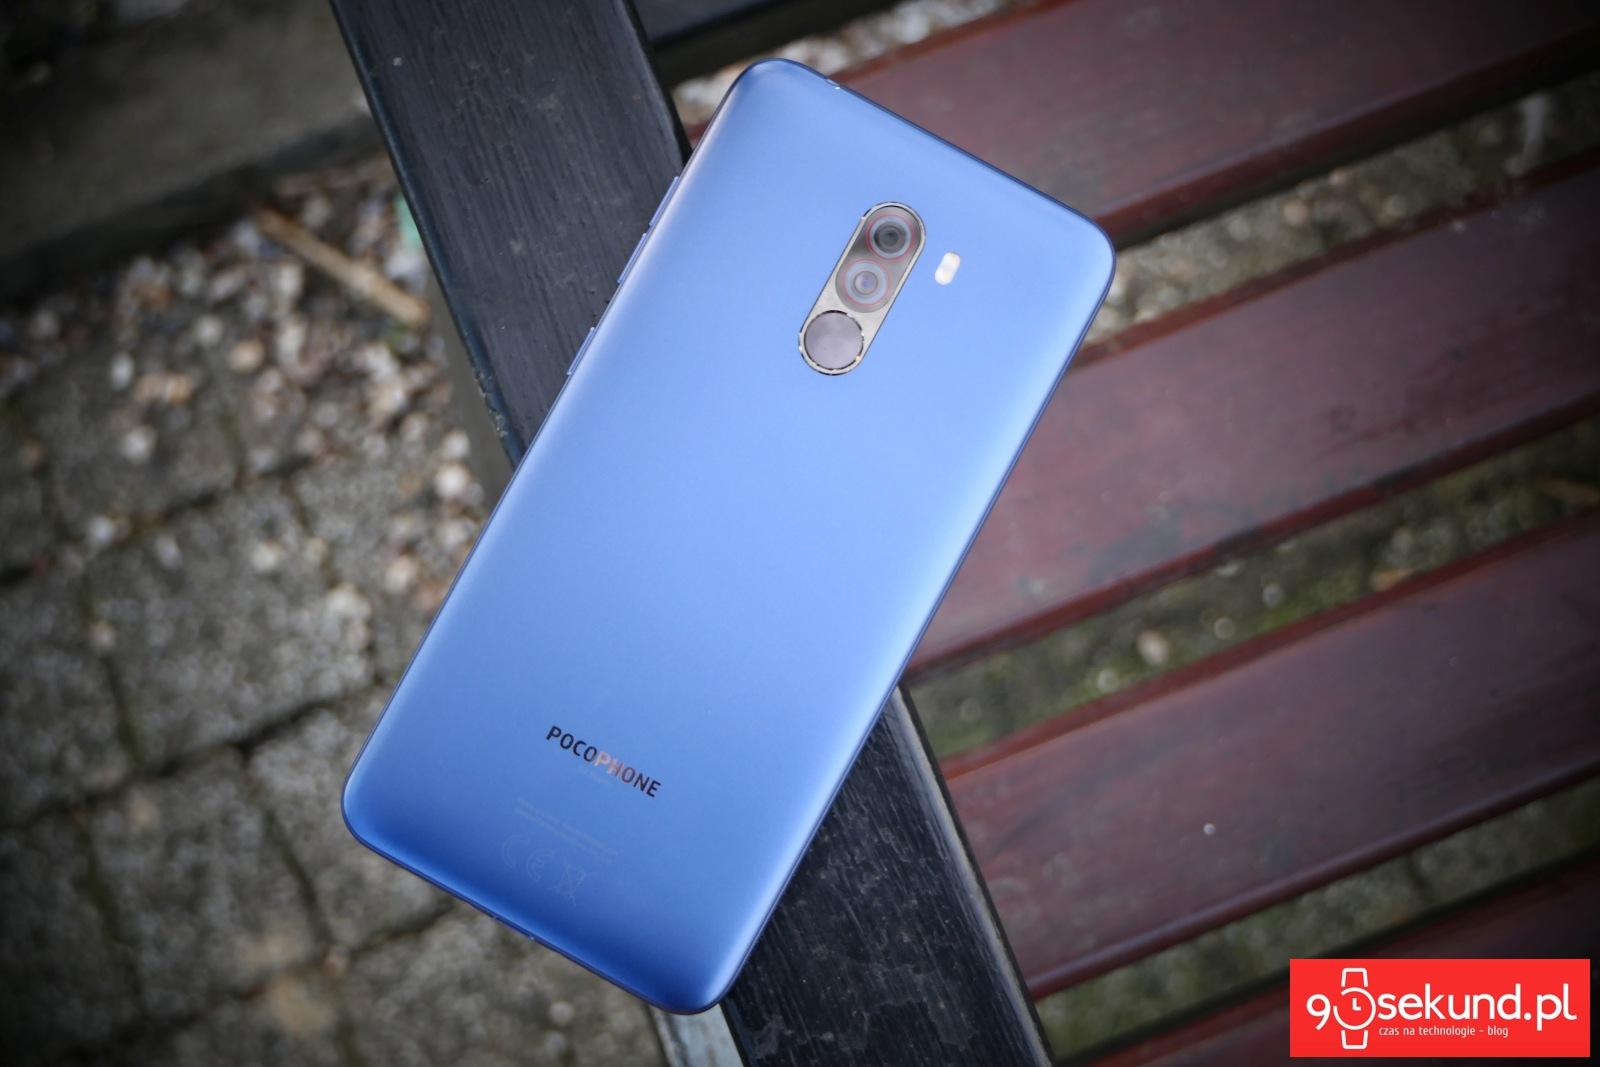 Recenzja Xiaomi Pocophone F1 - 90sekund.pl